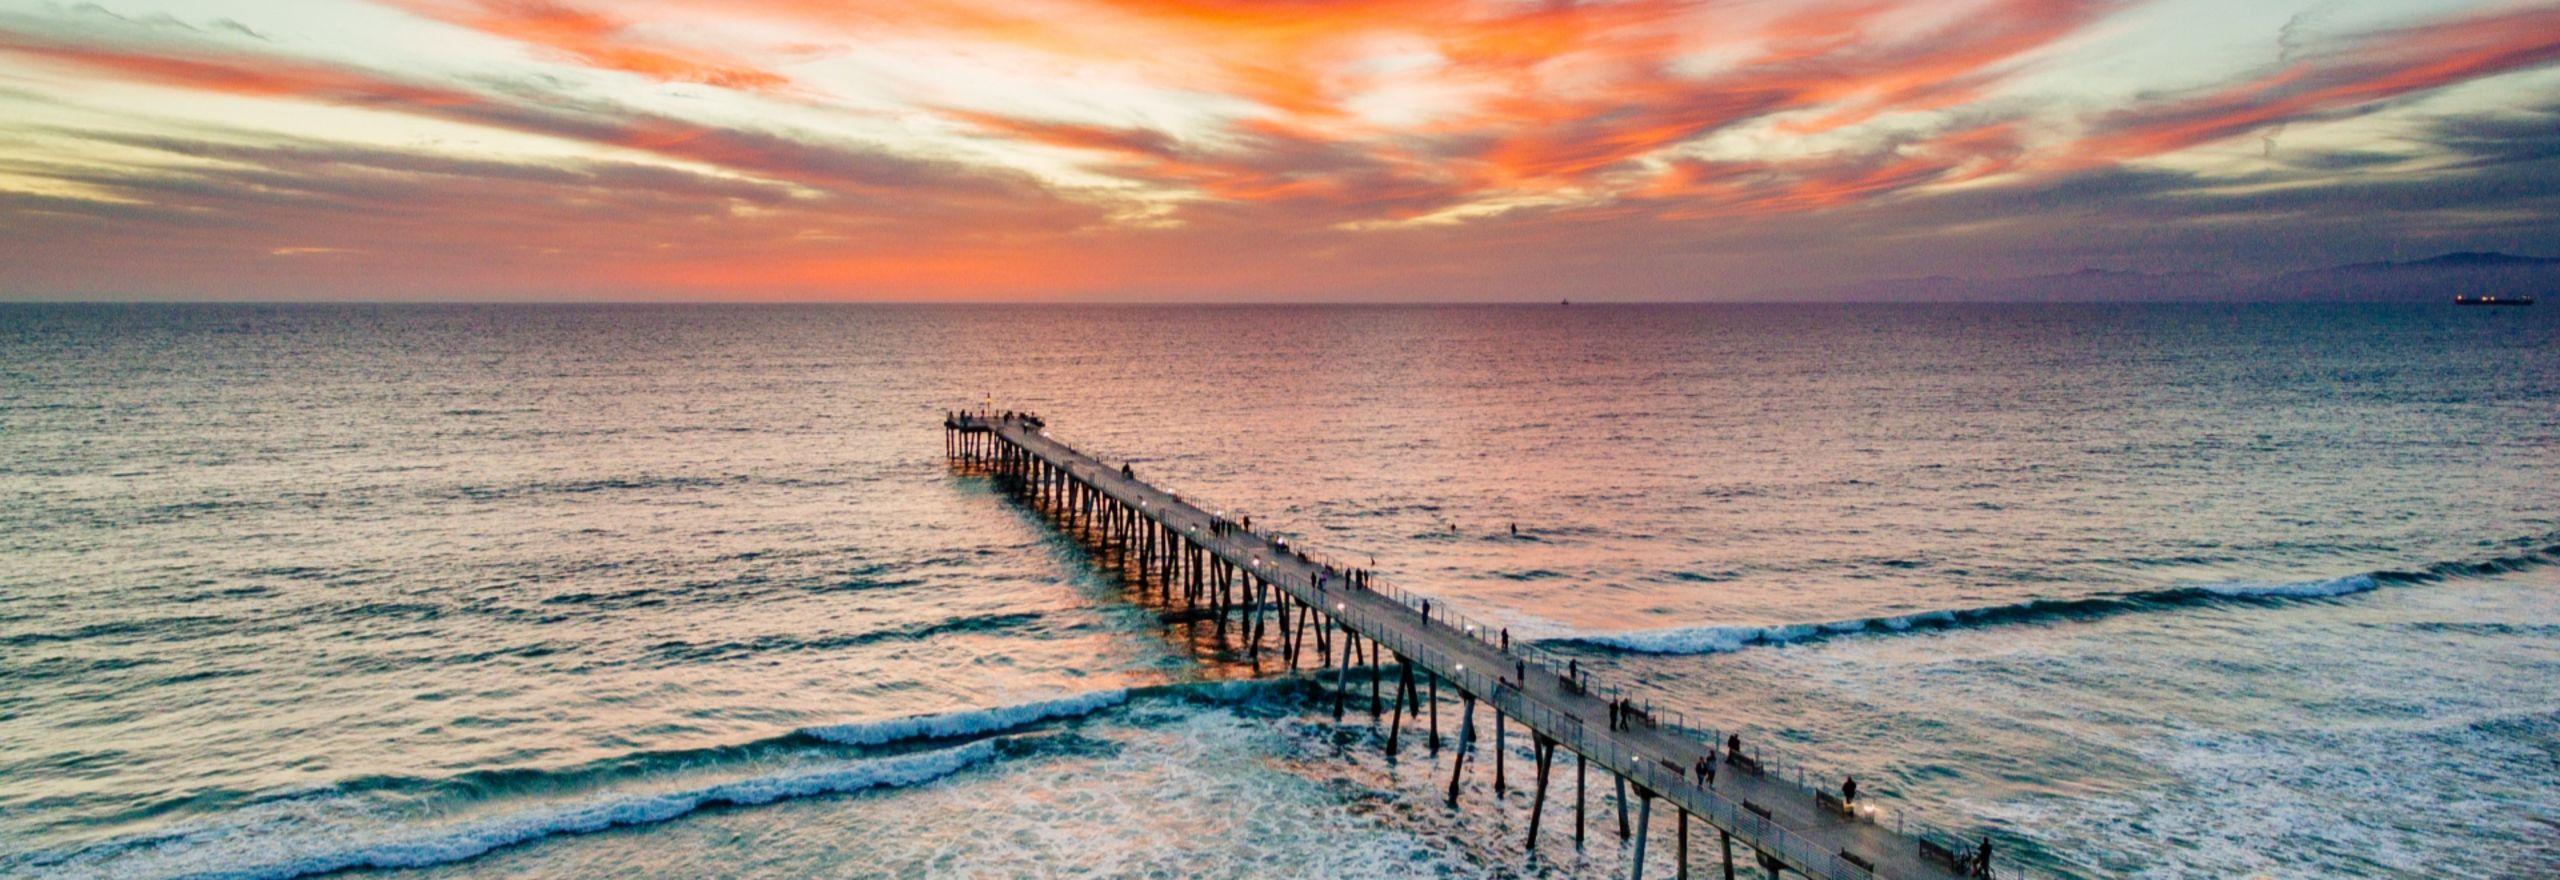 Real Estate September 2020 South Bay & Greater Los Angeles Market Statistics | The Lane Team